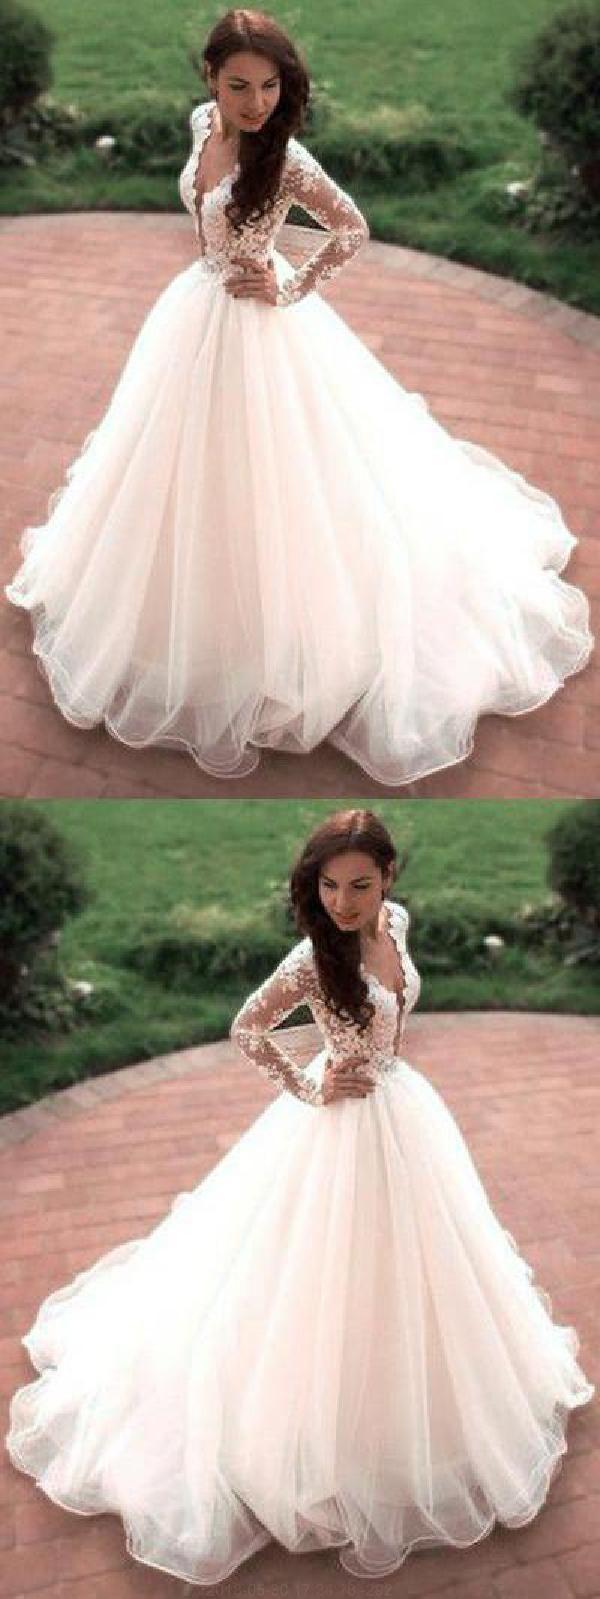 Wedding dresses weddingdresses wedding dresses white